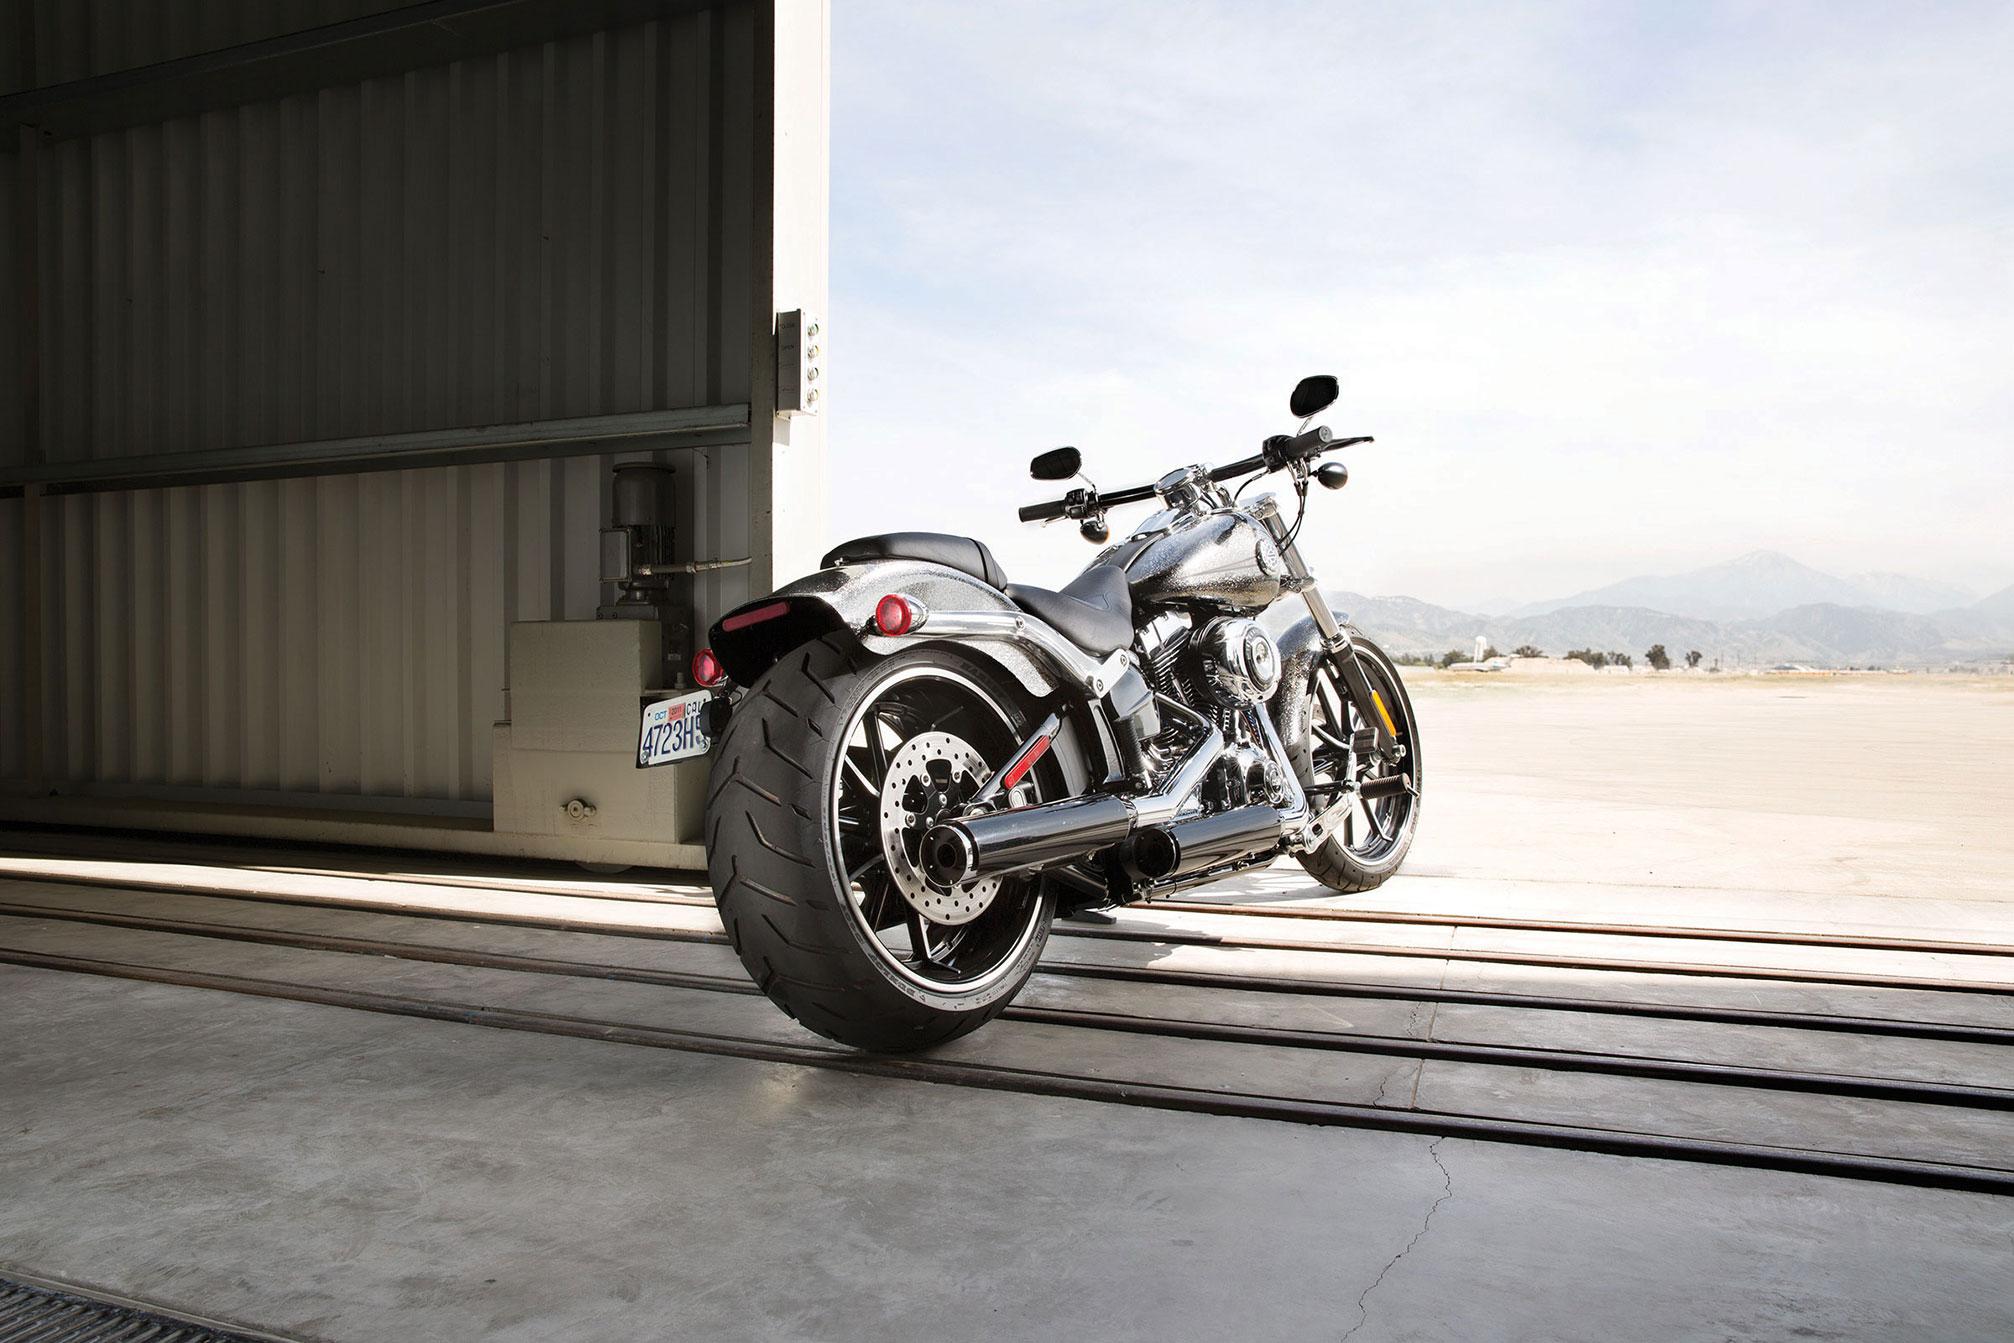 2014 Harley Davidson FXSB Breakout - 361.8KB